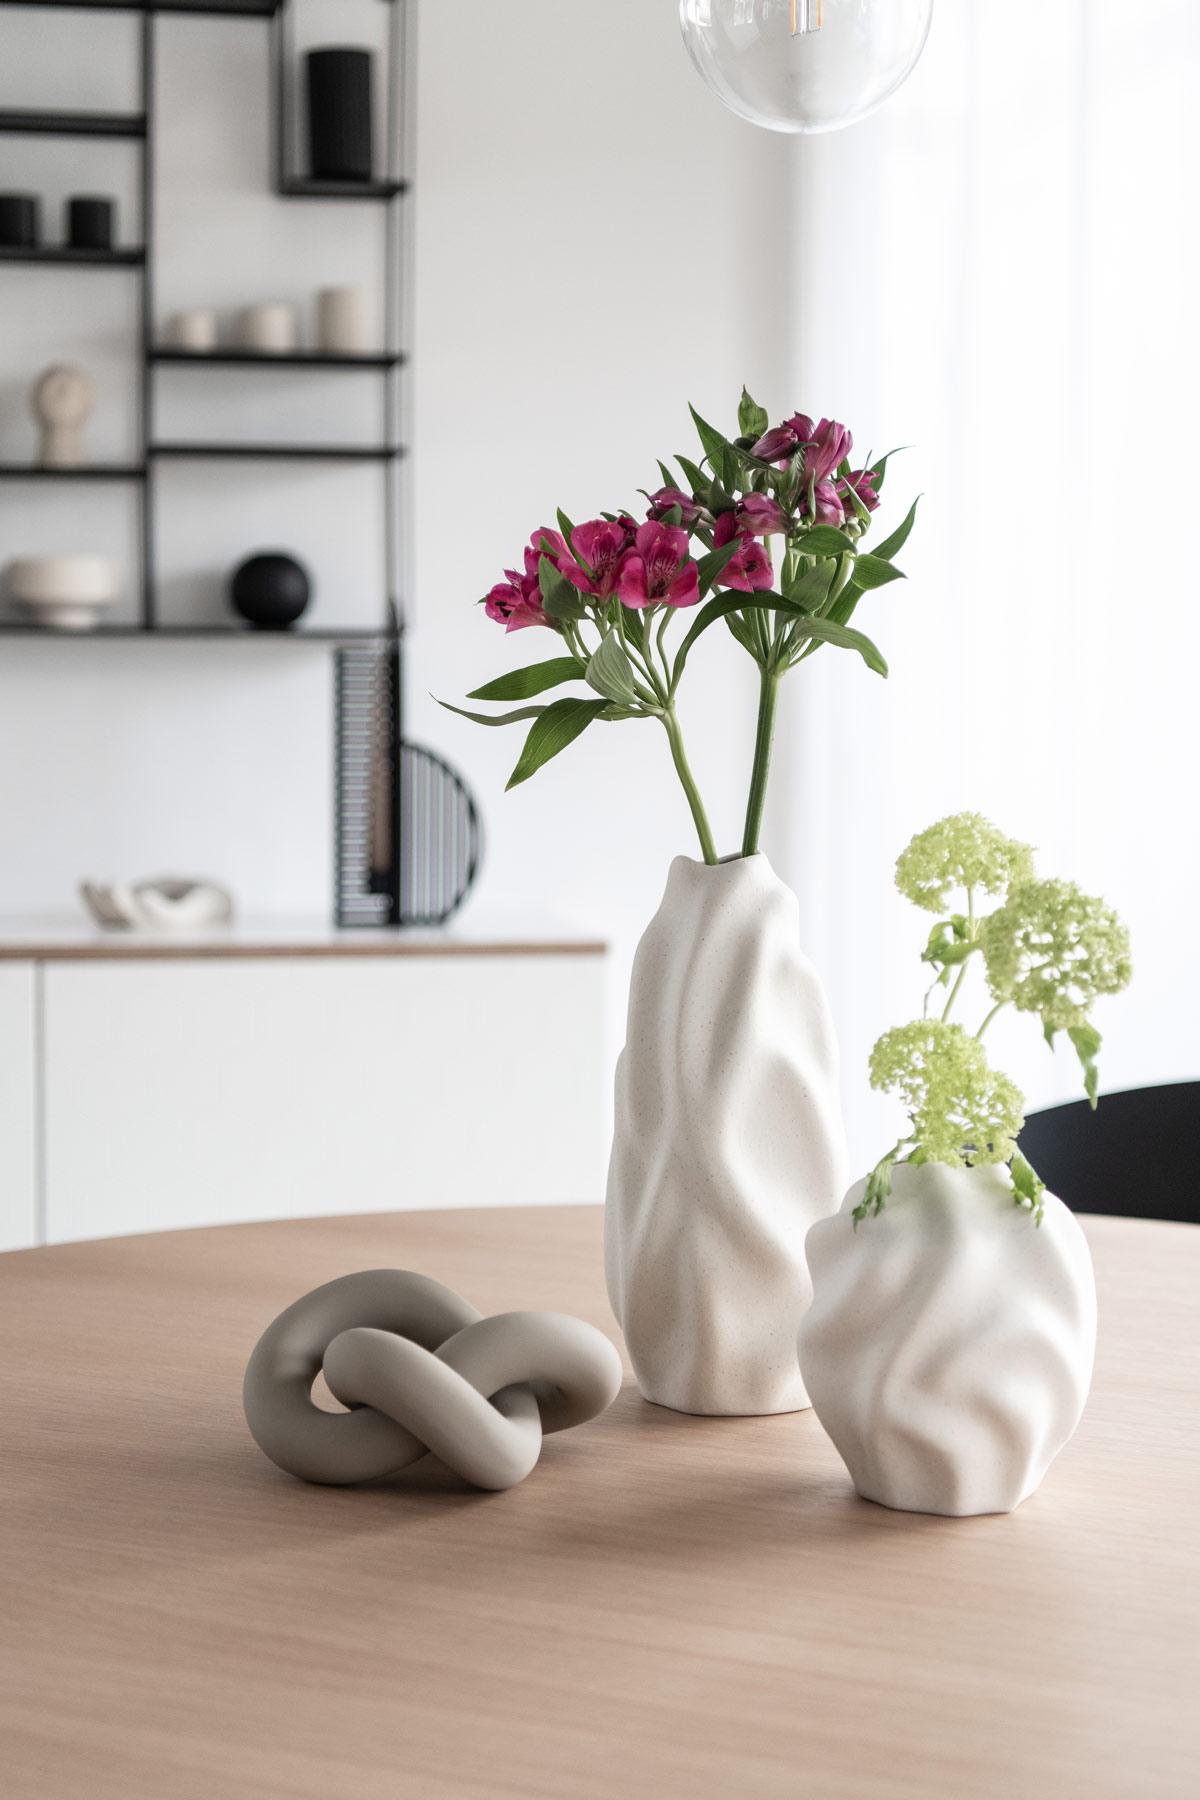 Vasen mit Frühlingsblumen